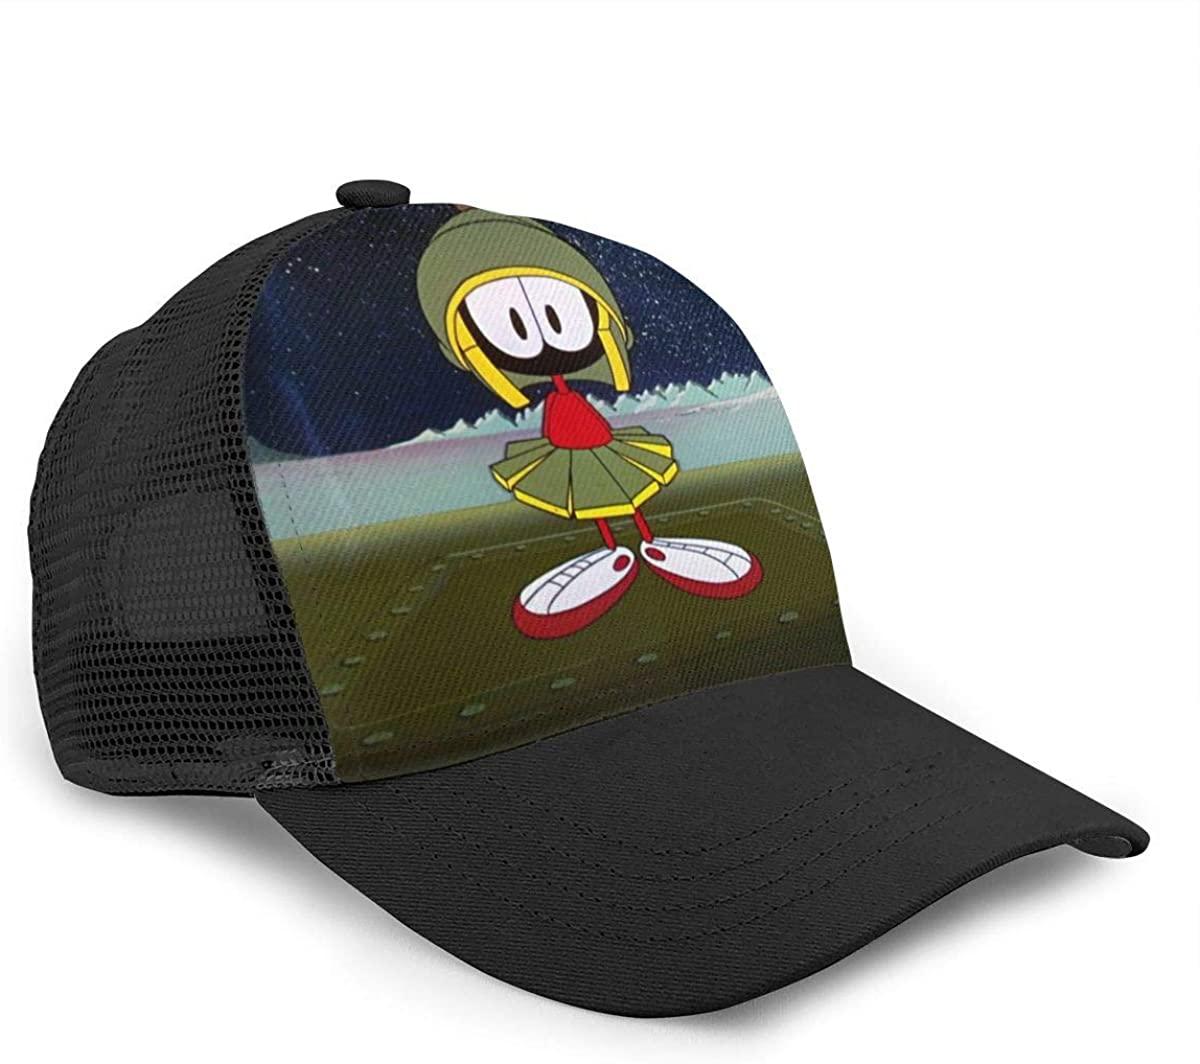 TYUGHJ Marovin The Martoian Summer Unisex Hip Hop Men Baseball Caps Women Breathable Mesh Hats Cap Black